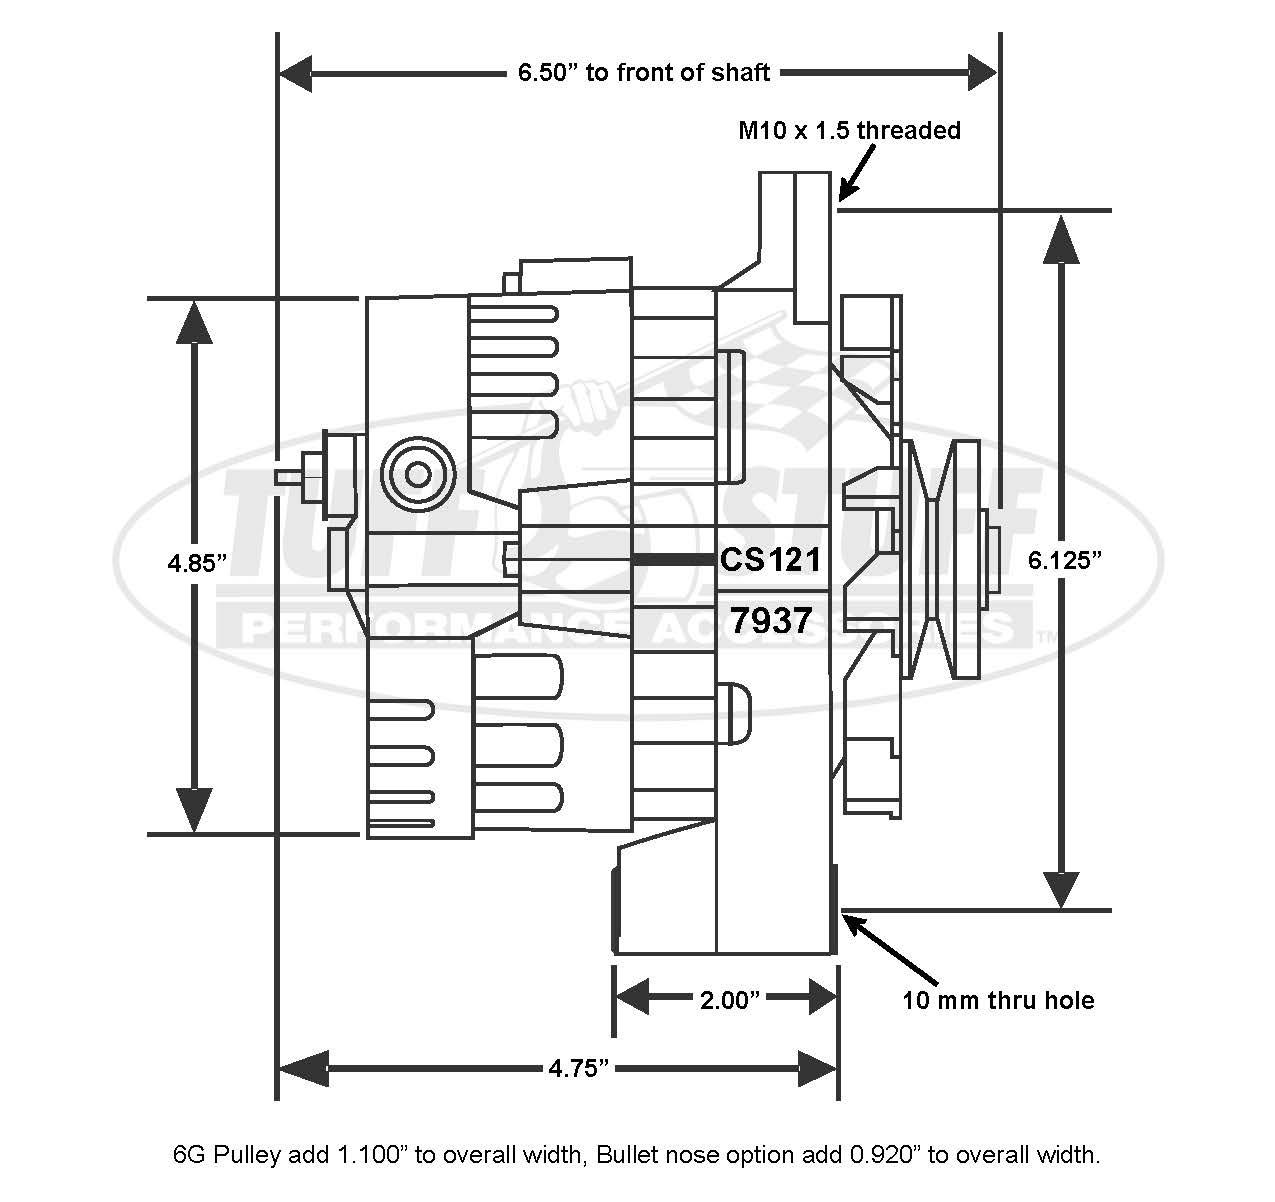 atv wiring diagram peace sports 110cc utility atv wiring diagram